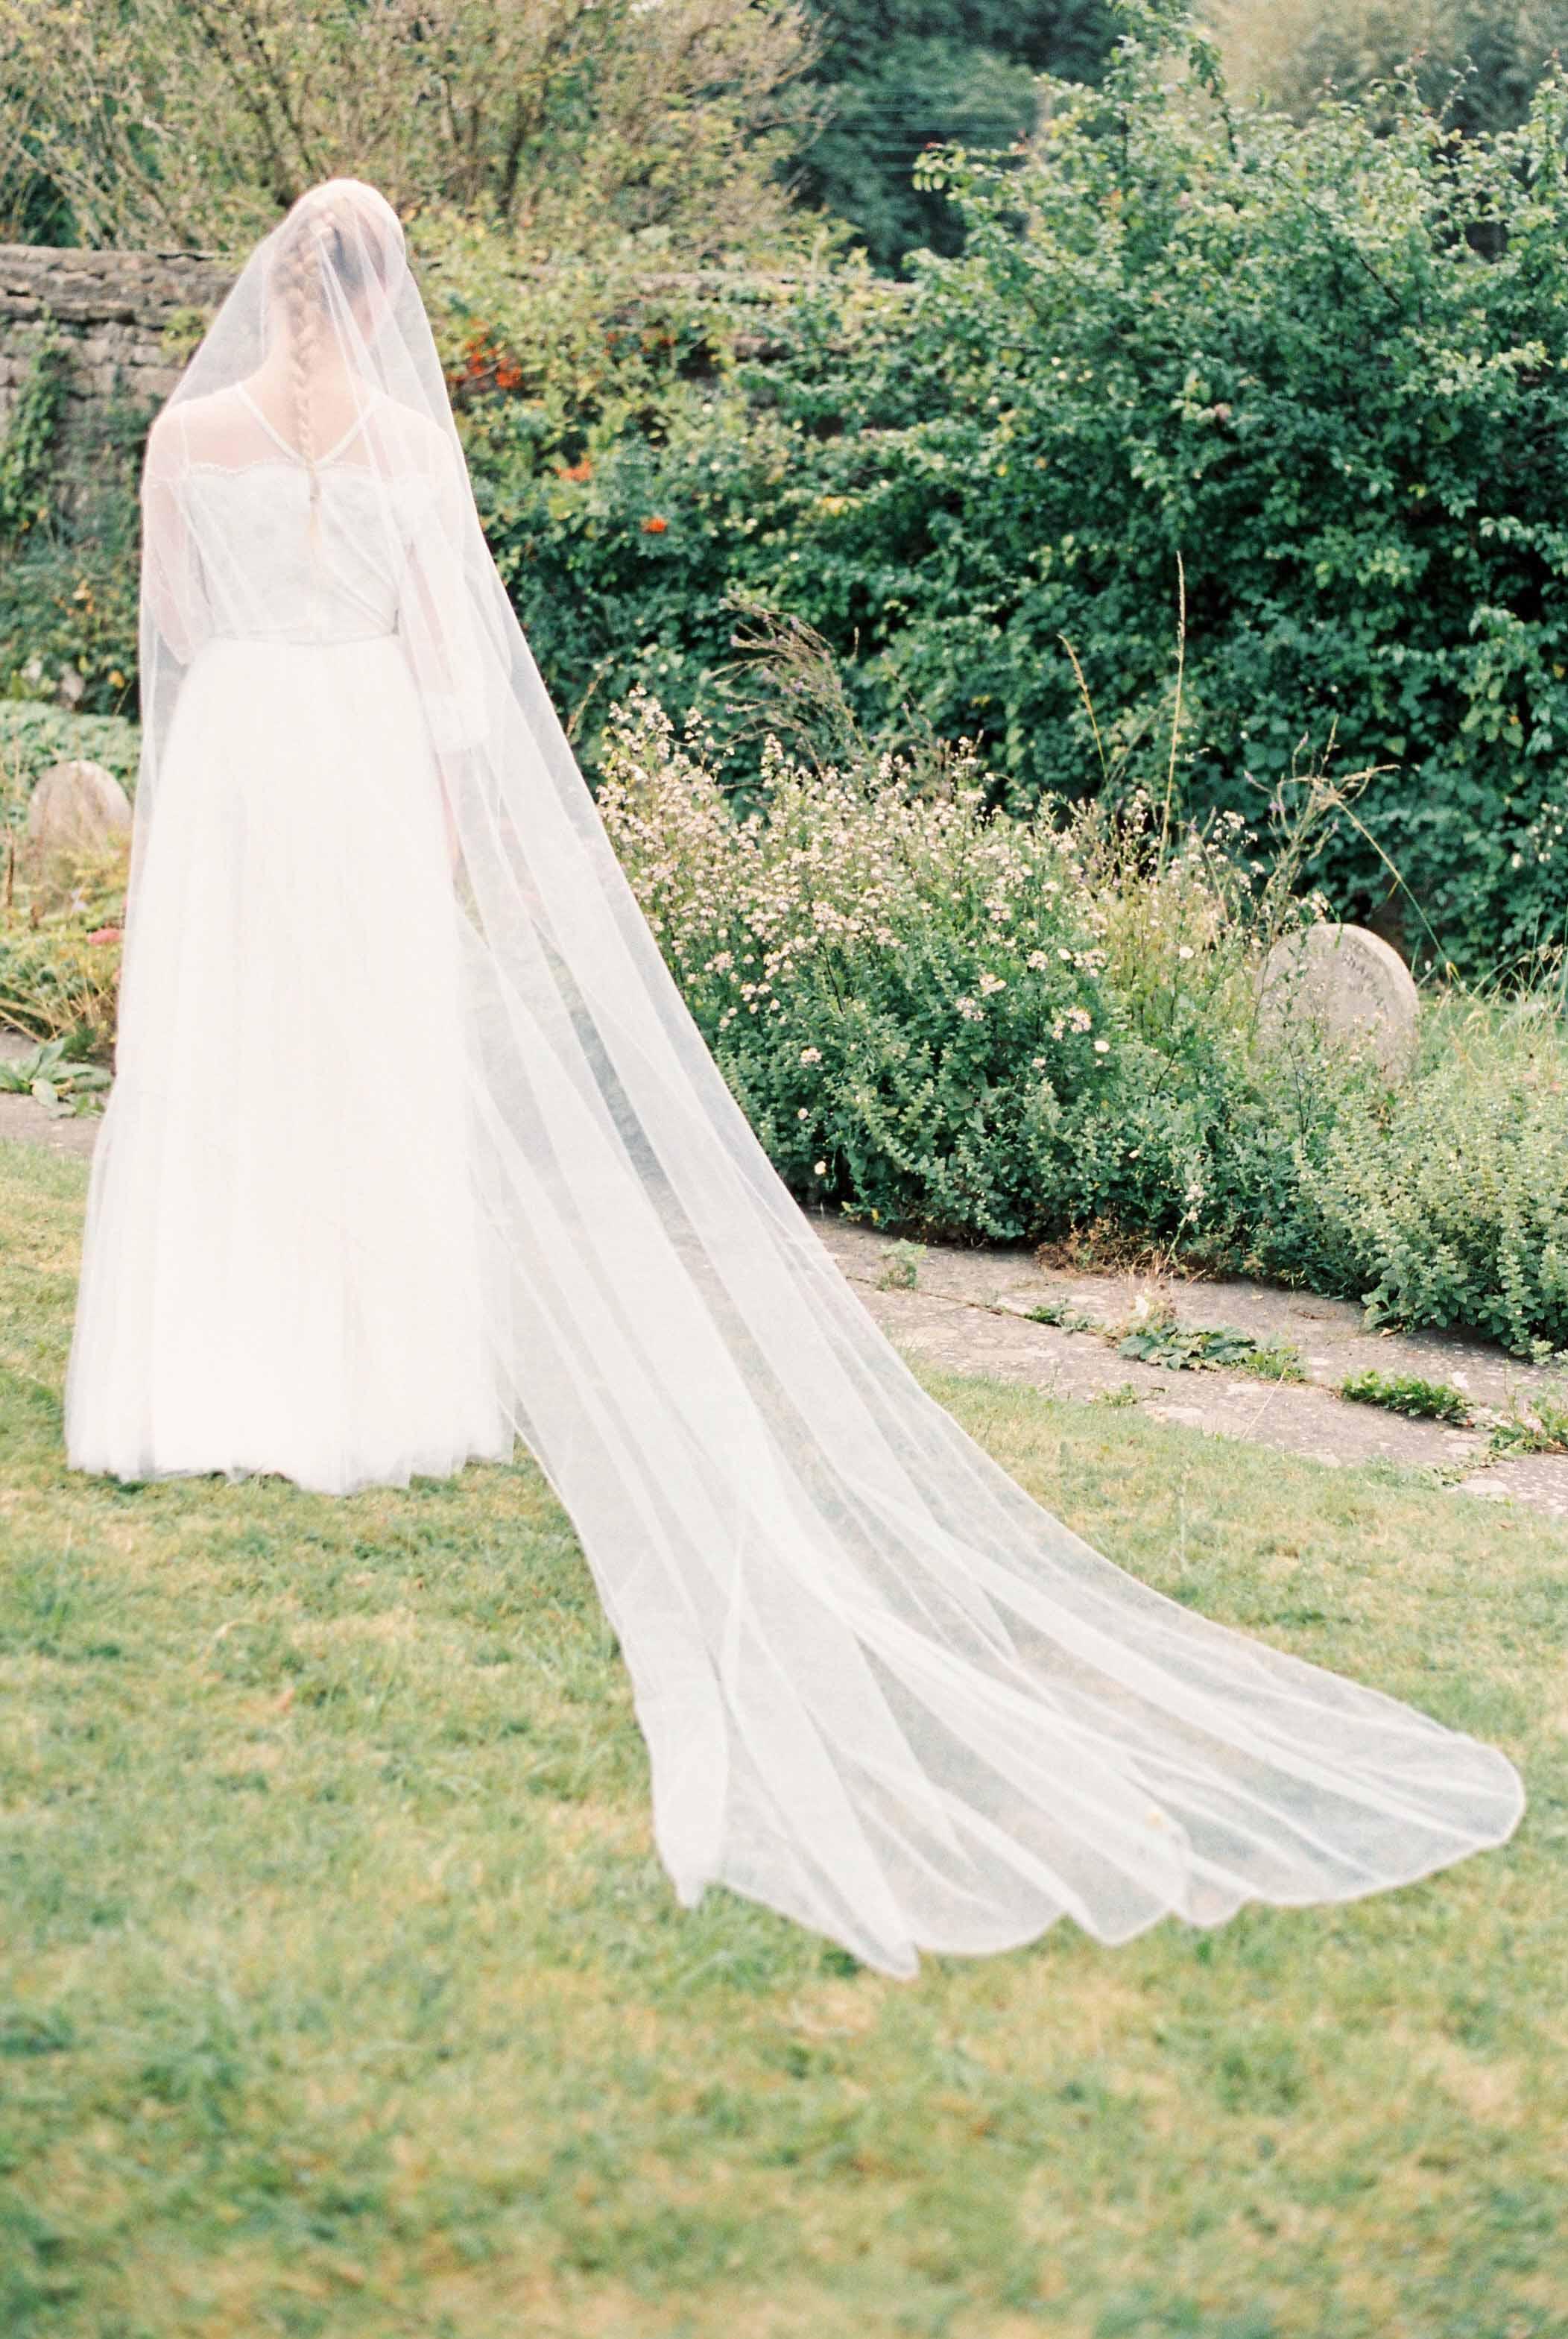 dorset-fine-art-wedding-photographer_amelia_carmencita_lores-12-of-24